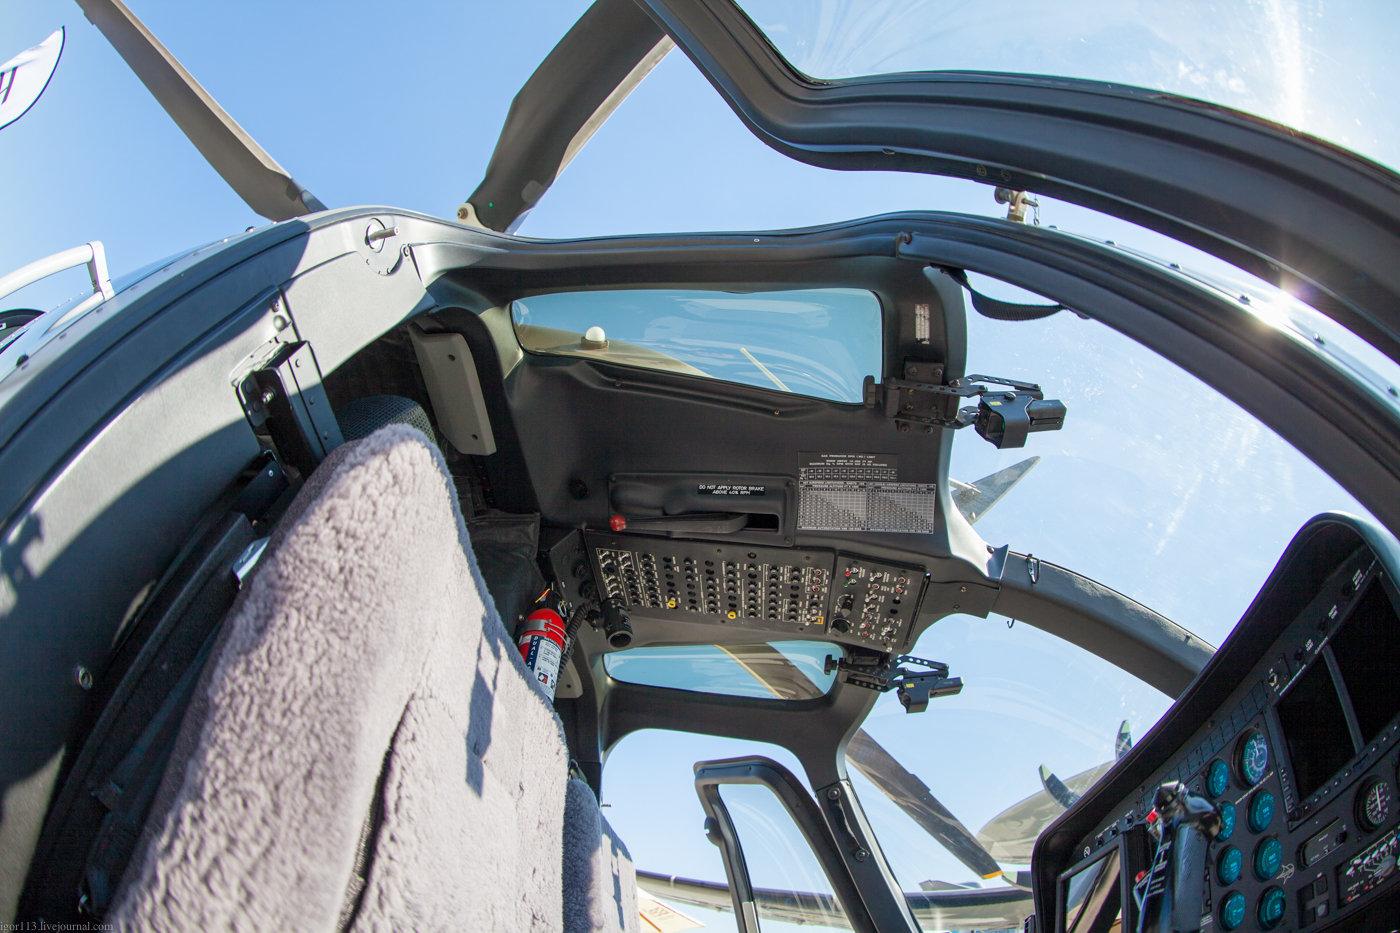 http://cdn1.share.slickpic.com/u/IgorKolokolov/2011Bell407/org/IMG_7502/web.jpg